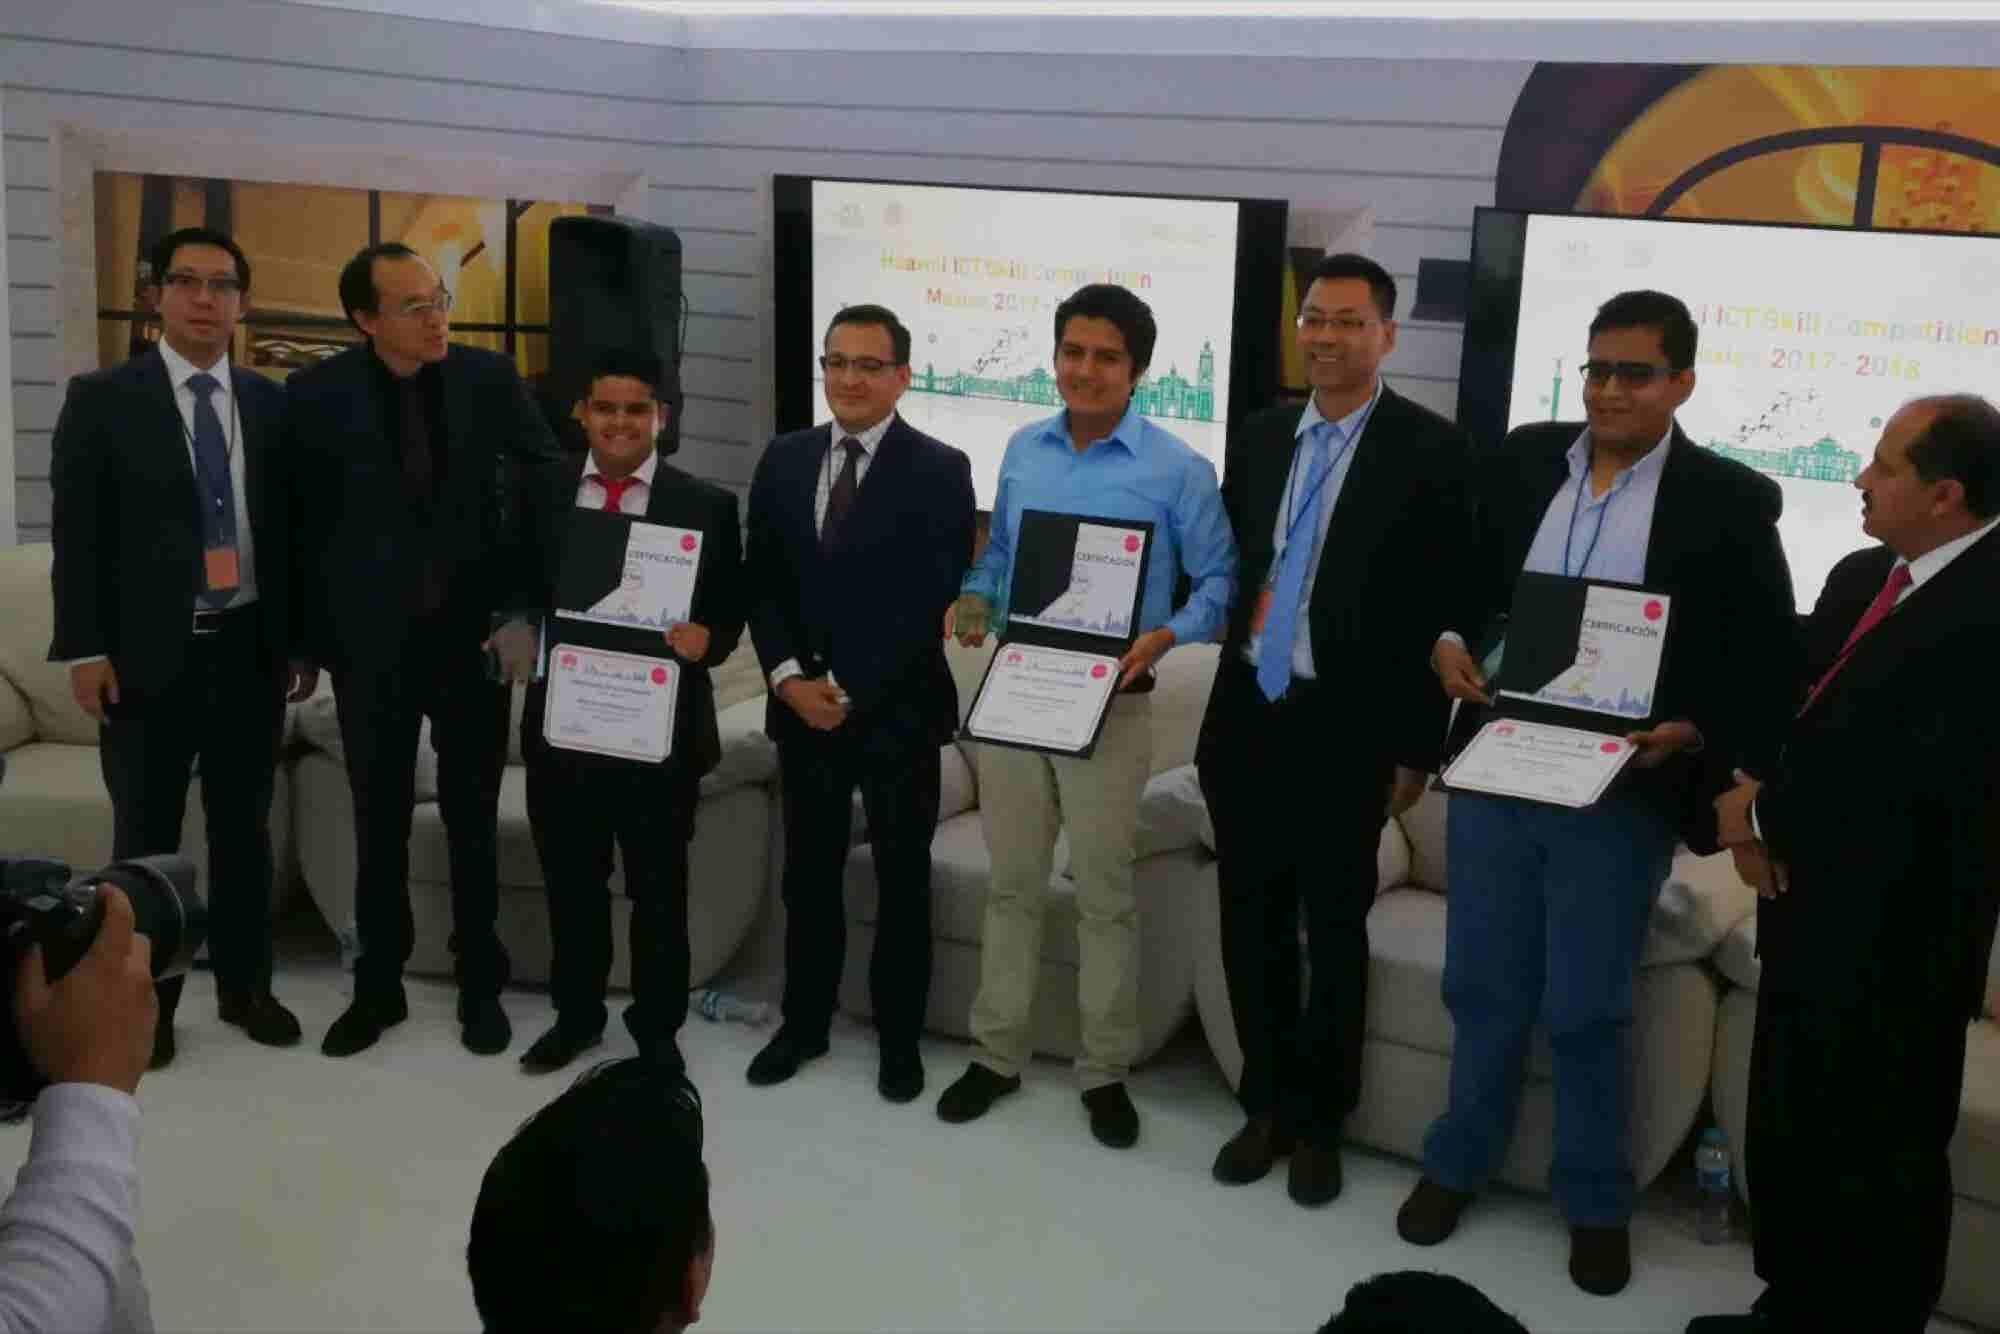 Estudiantes mexicanos demuestran habilidades e irán a China a competir en ICT Skills 2018